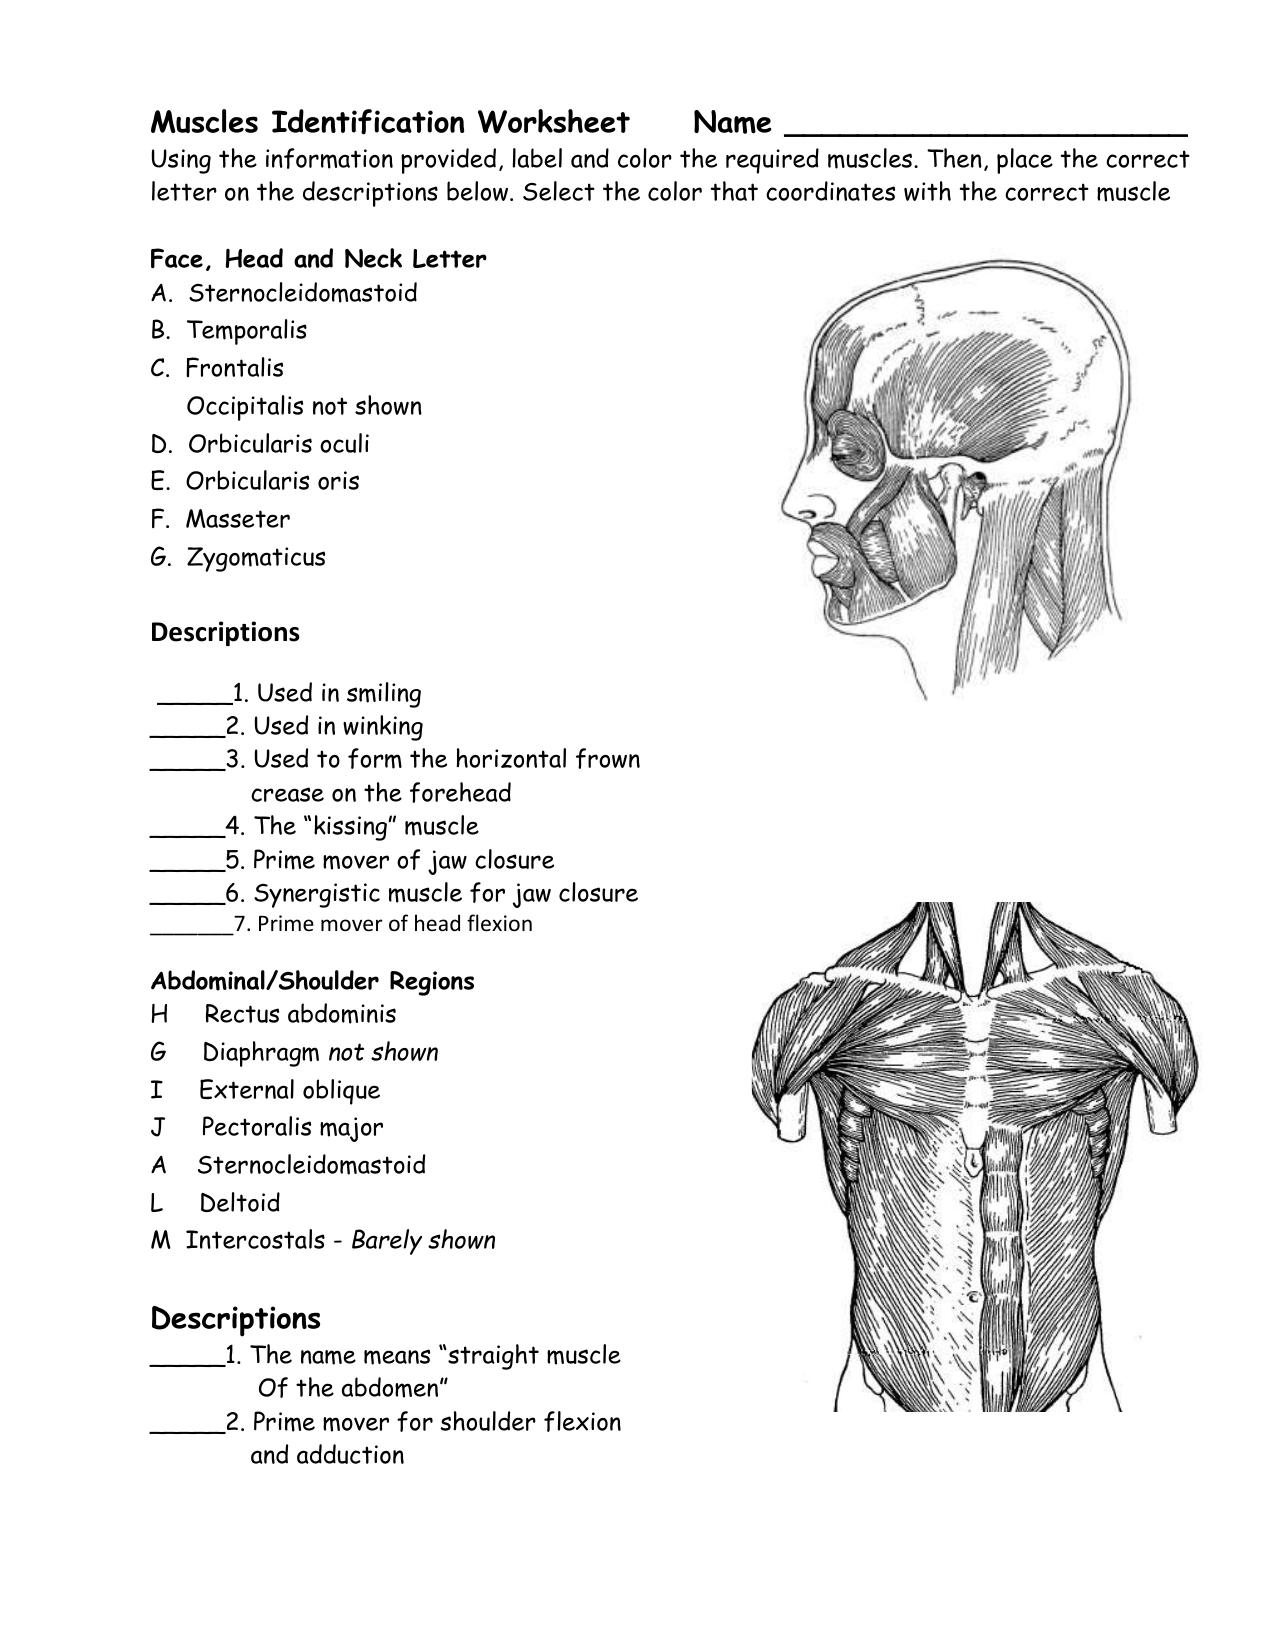 Worksheets Muscle Identification Worksheet muscular system worksheet name